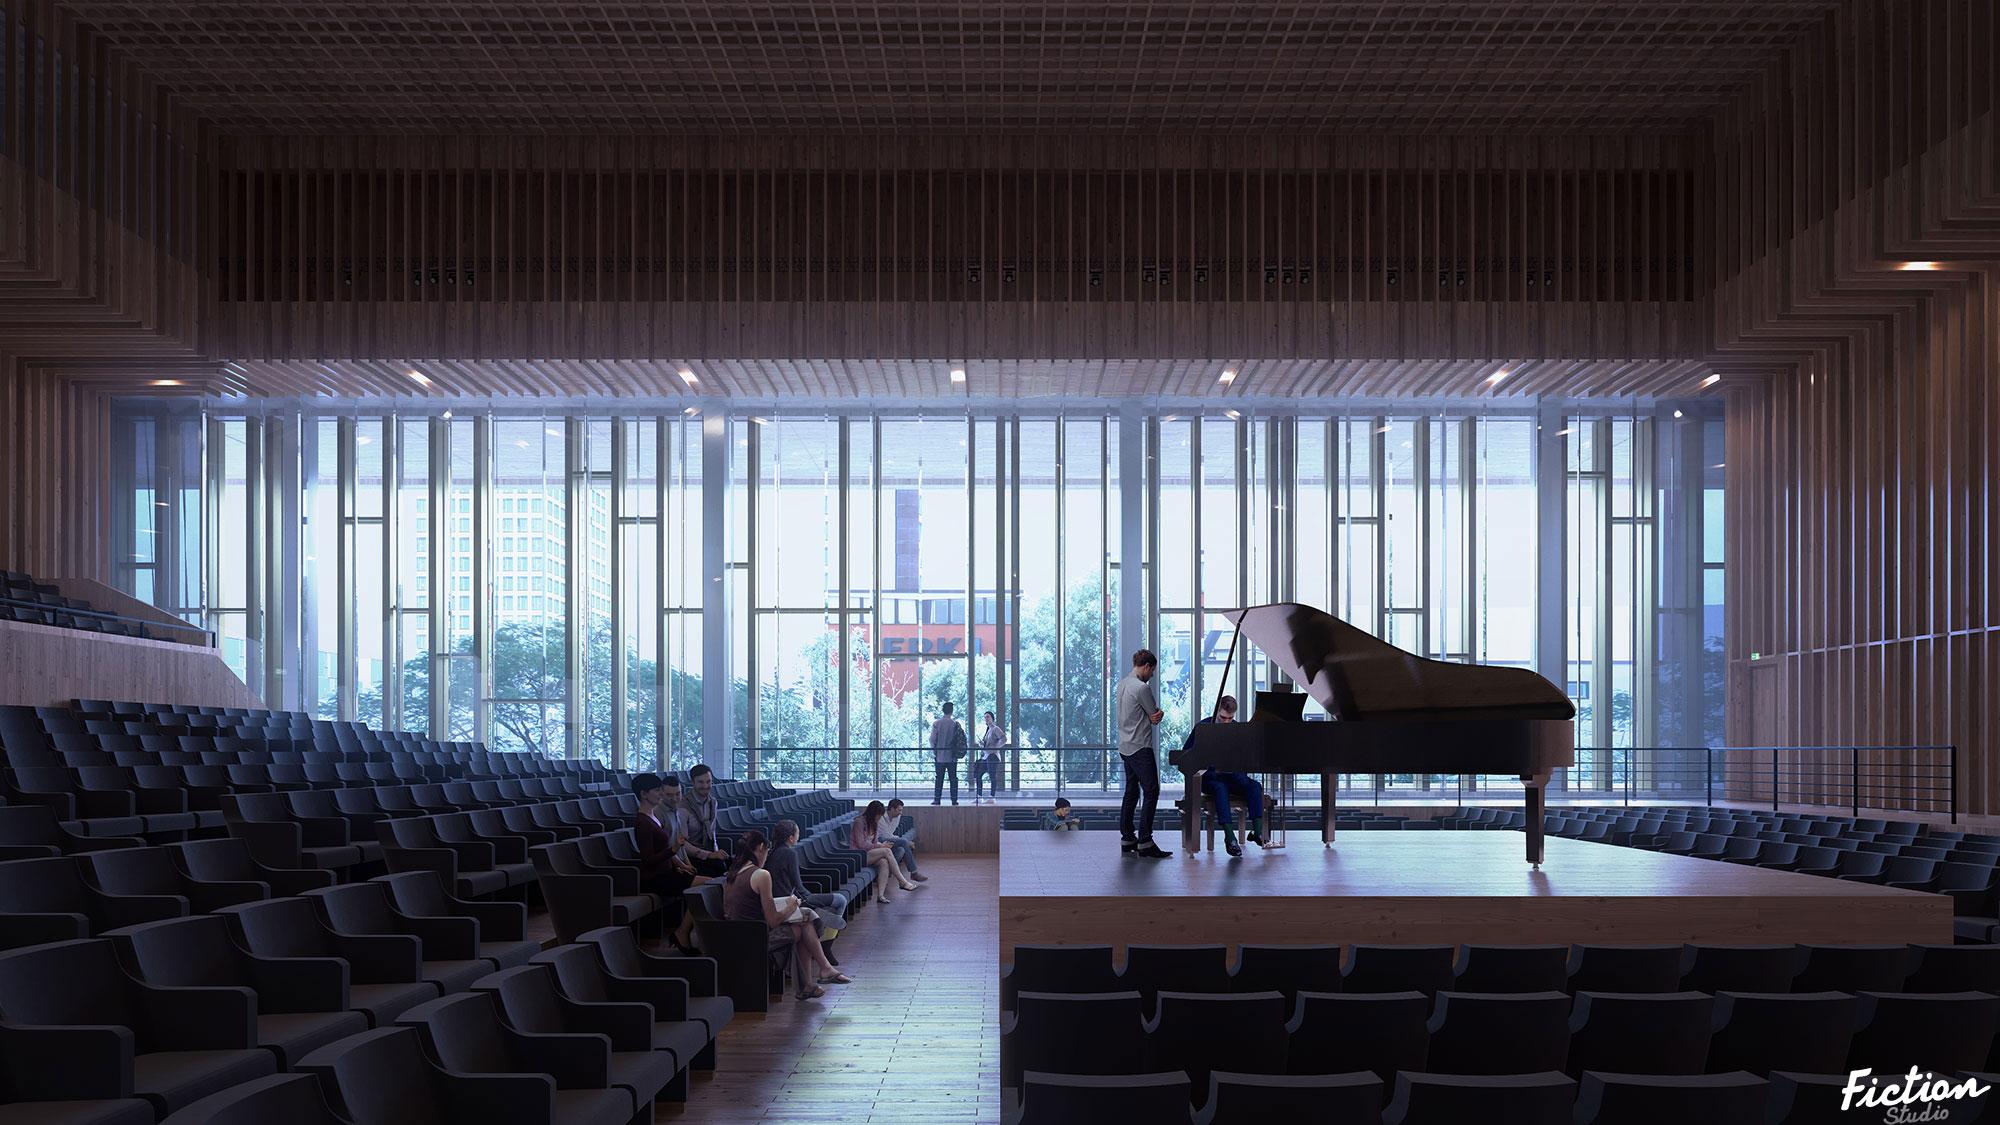 Mecanoo - Munich Concert Hall - Germany